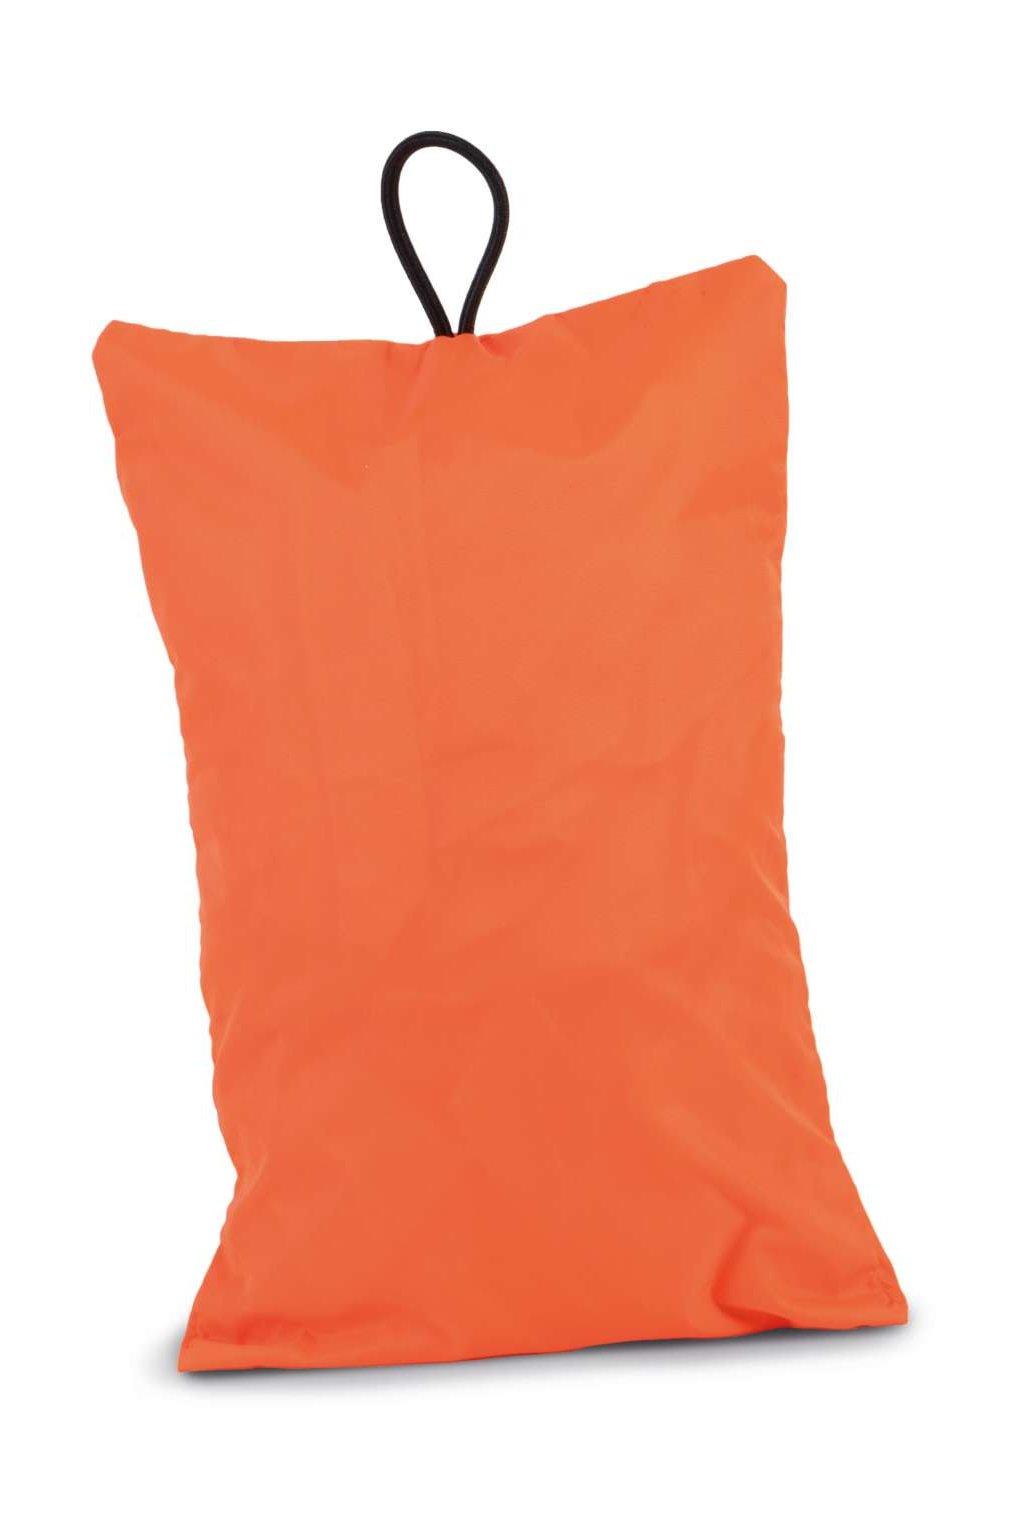 Nepromokavý potah na batoh s objemem 20/35L